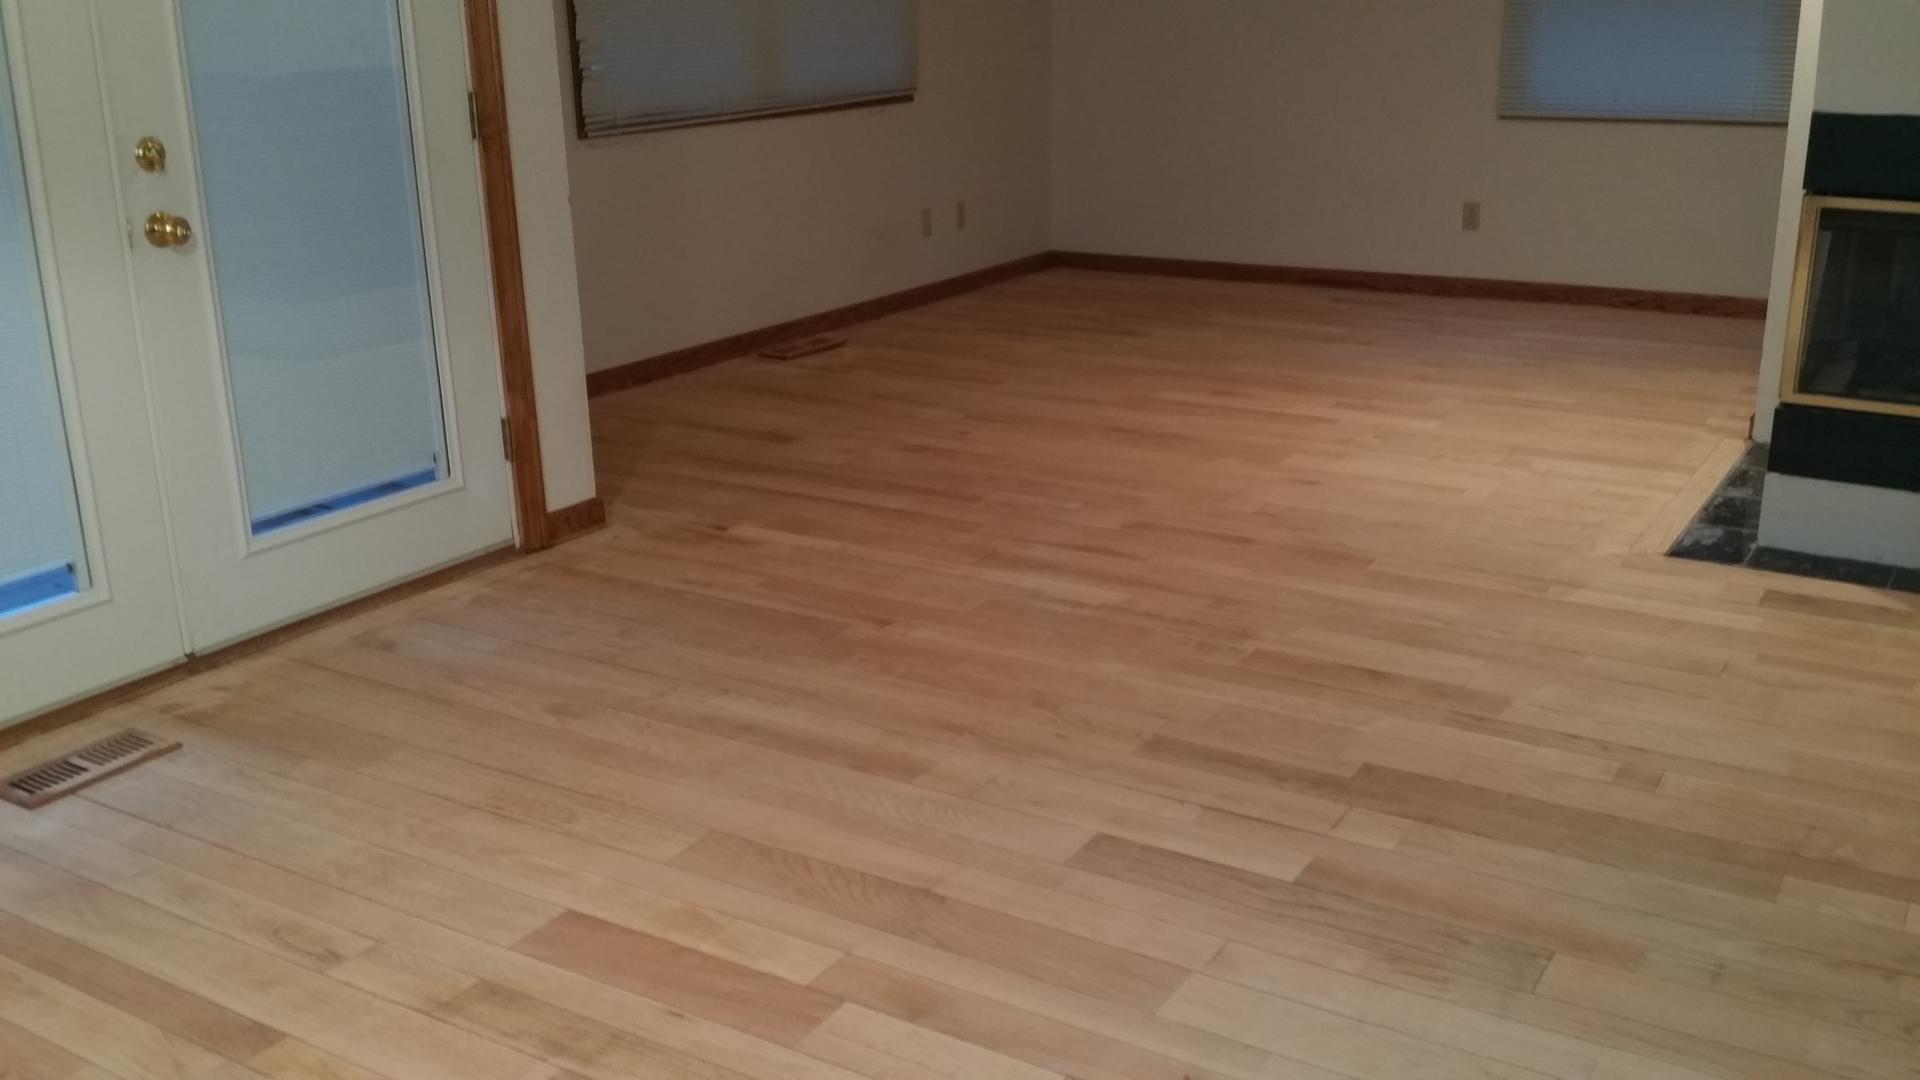 installation floor contractor maintenance img restoration hardwood coats services flooring